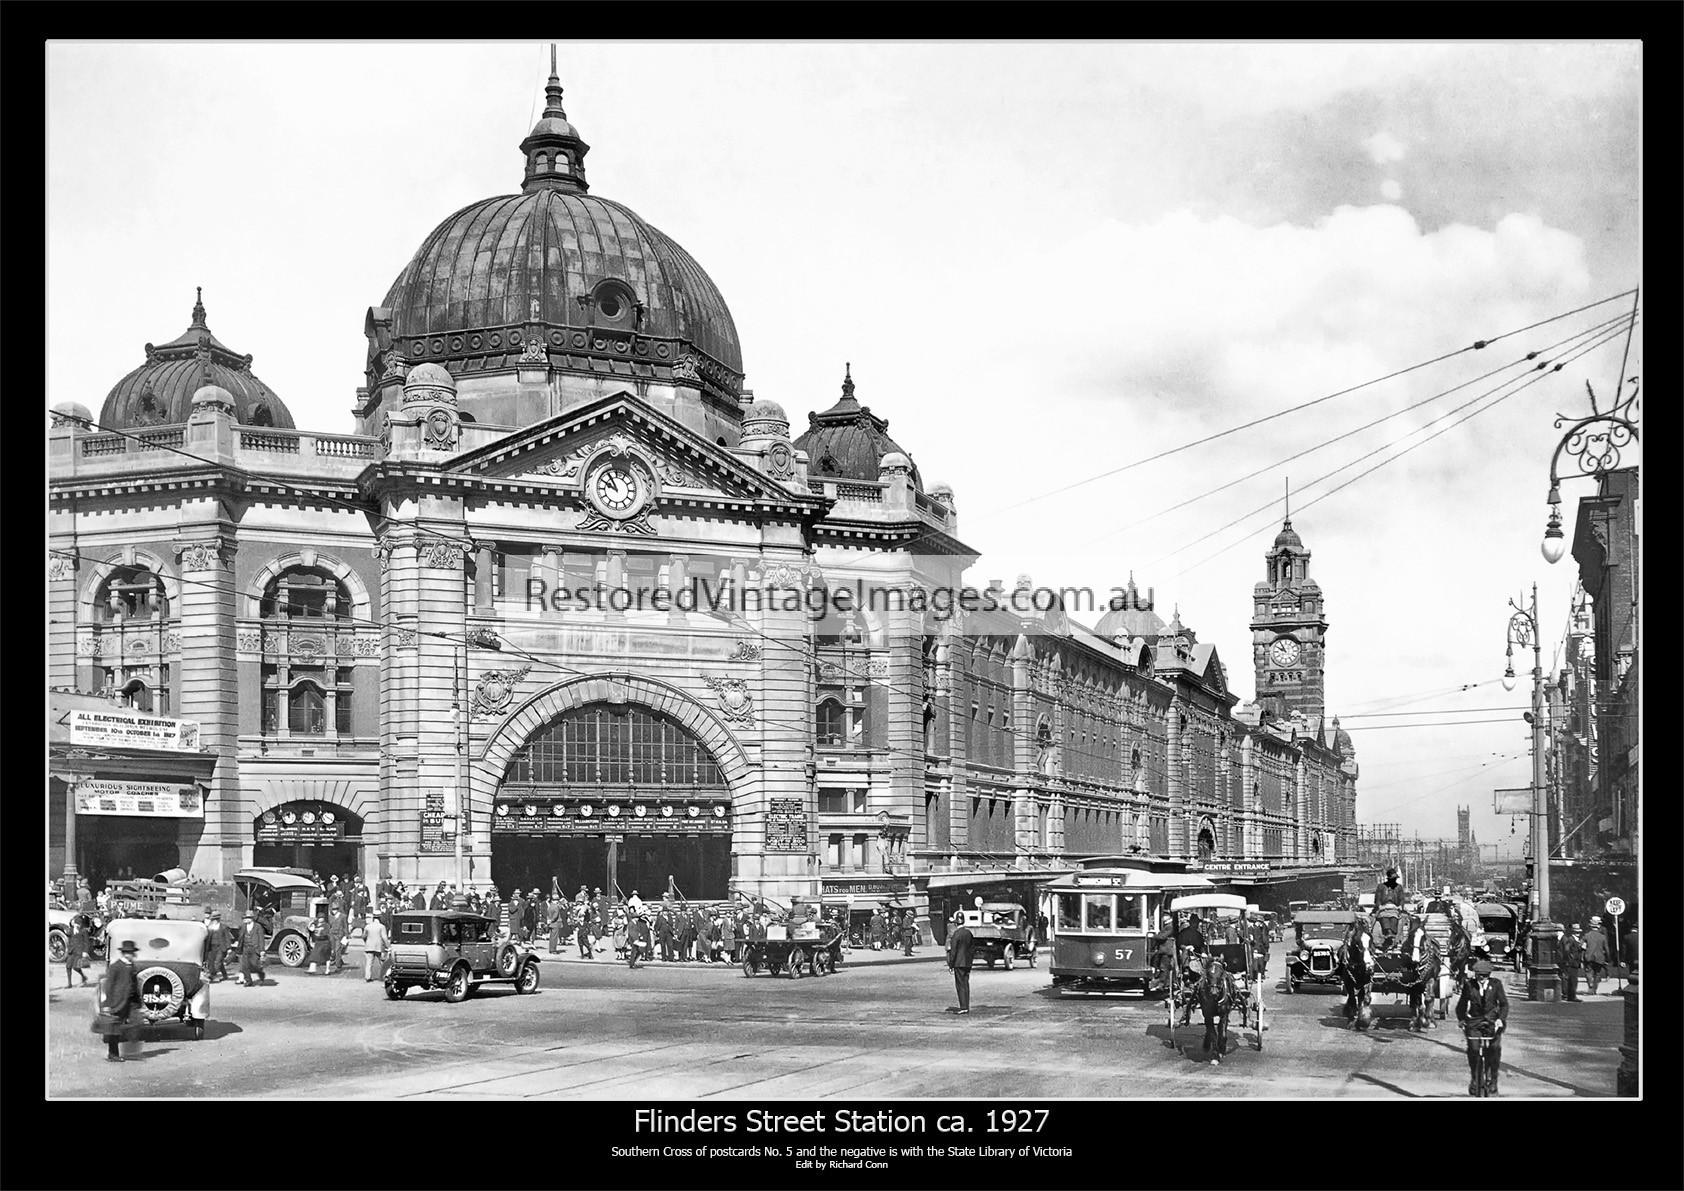 Flinders Street Station Ca. 1927